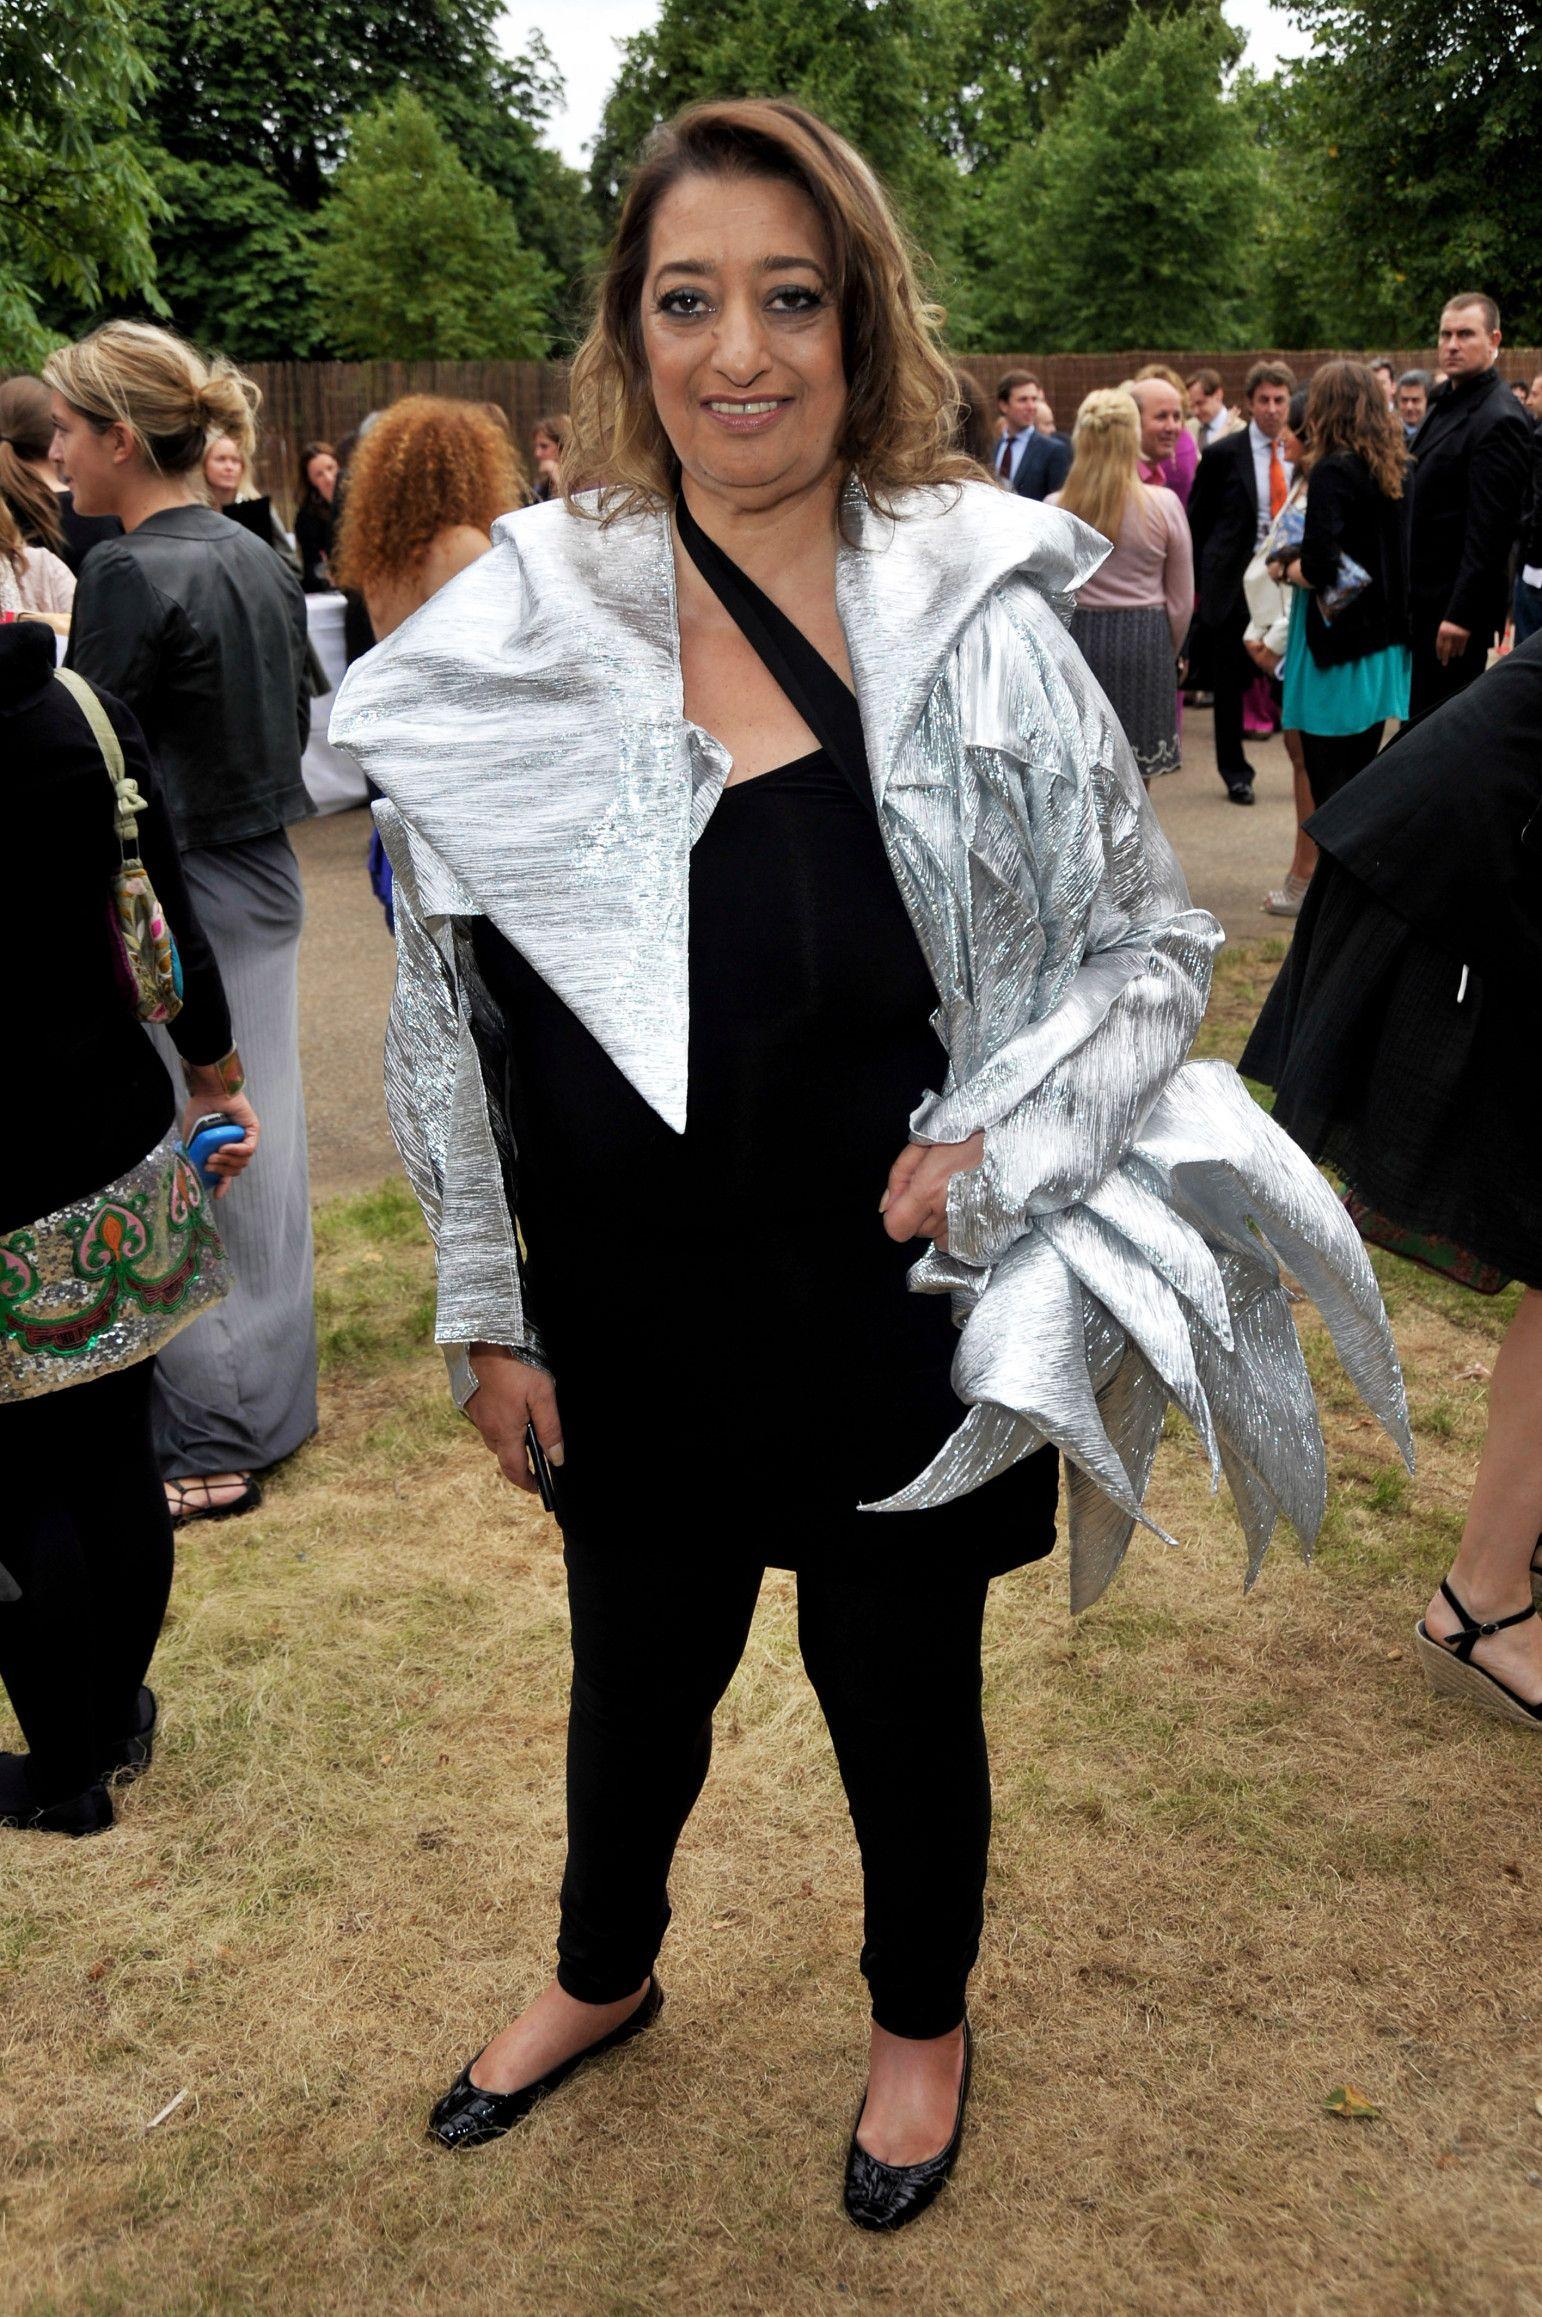 Zaha Hadid Style zaha hadid's daring style | zaha hadid | pinterest | zaha hadid